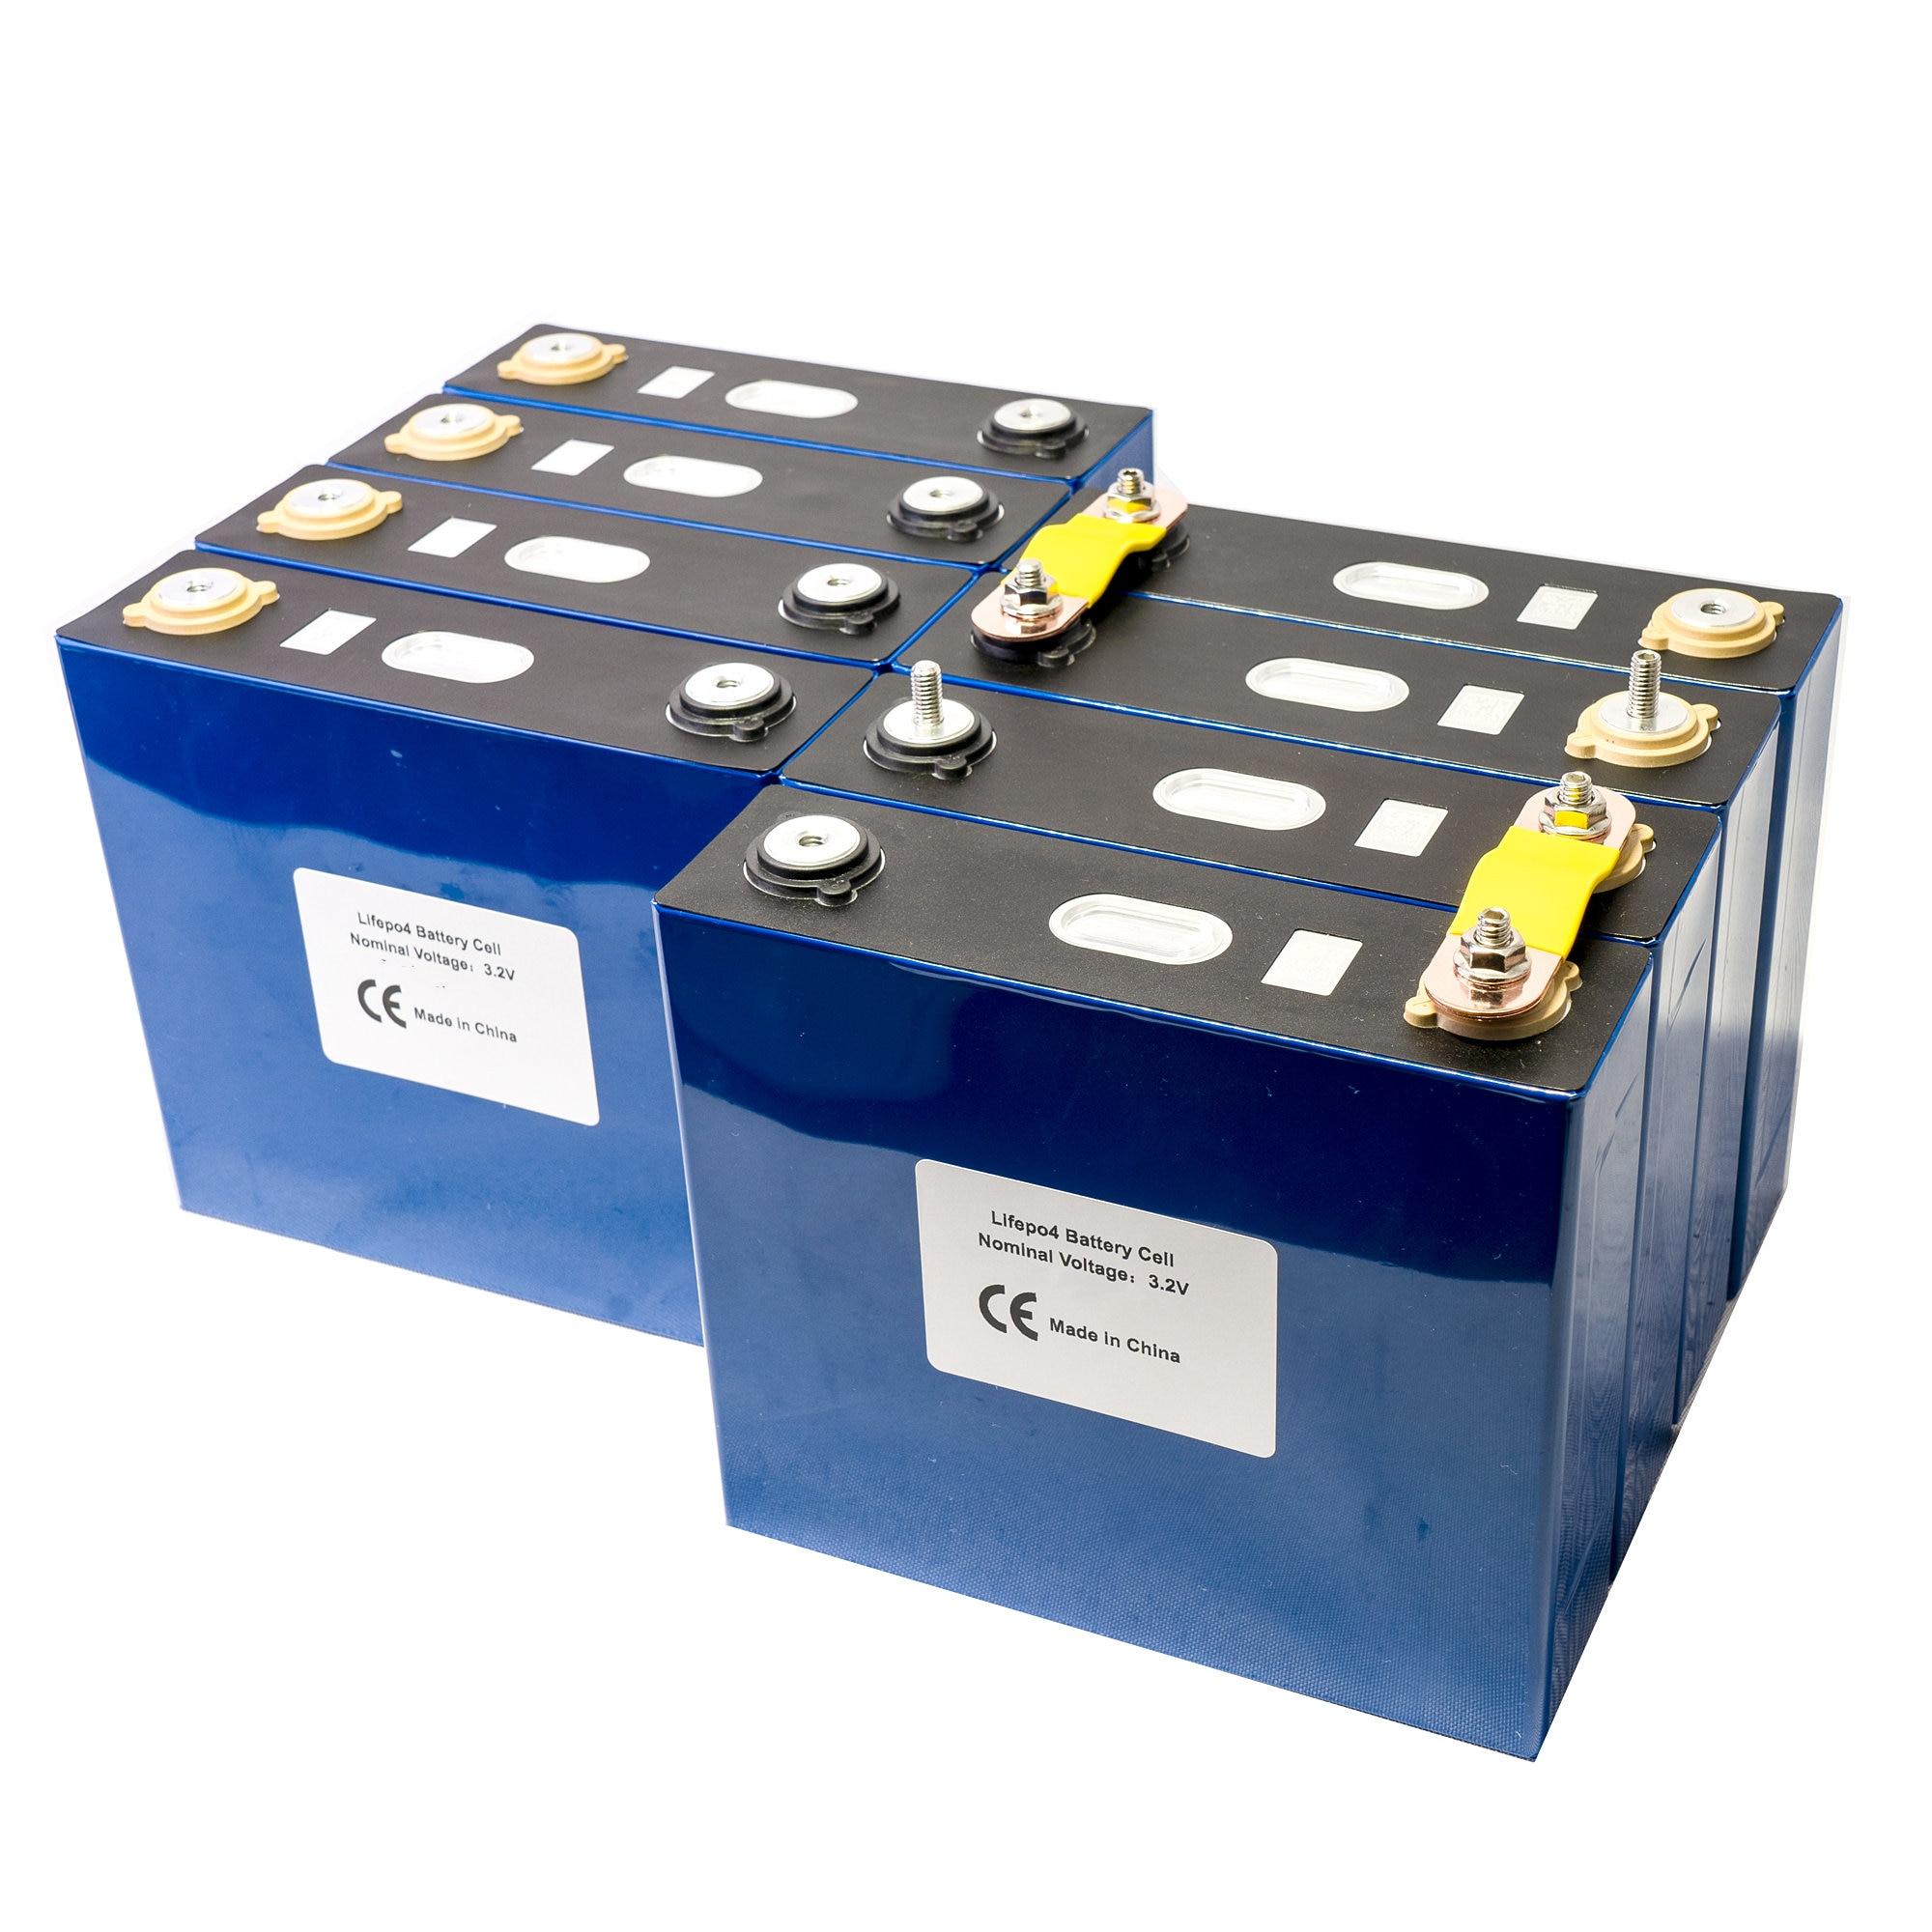 3.2V 120Ah lifepo4 battery GRADE A LFP lithium solar 12V 24V120Ah cells not 100Ah US Local warehouse UPS or FedEx Fast delivery